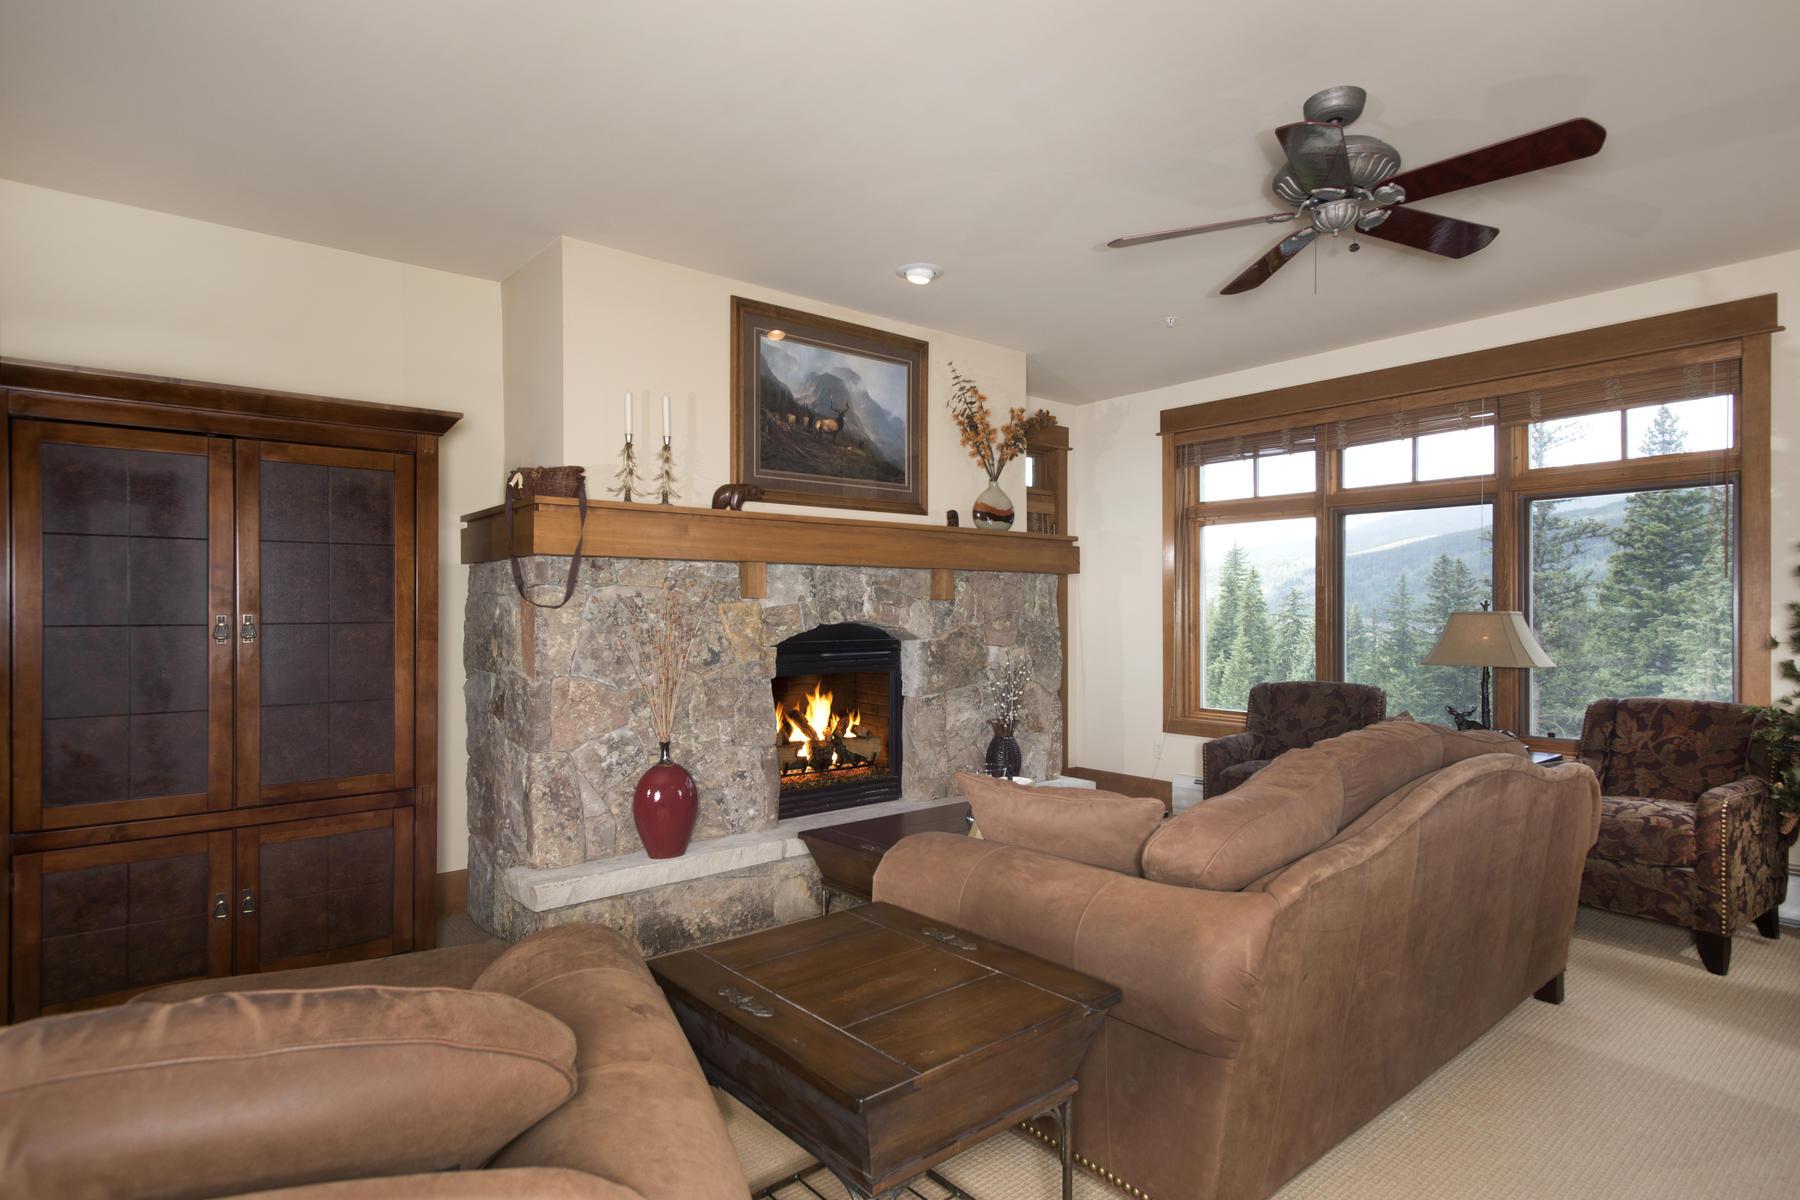 Condominium for Active at Ski In/Ski Out Condo with Mountain & River Views 280 Trail Head Drive Unit 3037 Keystone, Colorado 80435 United States